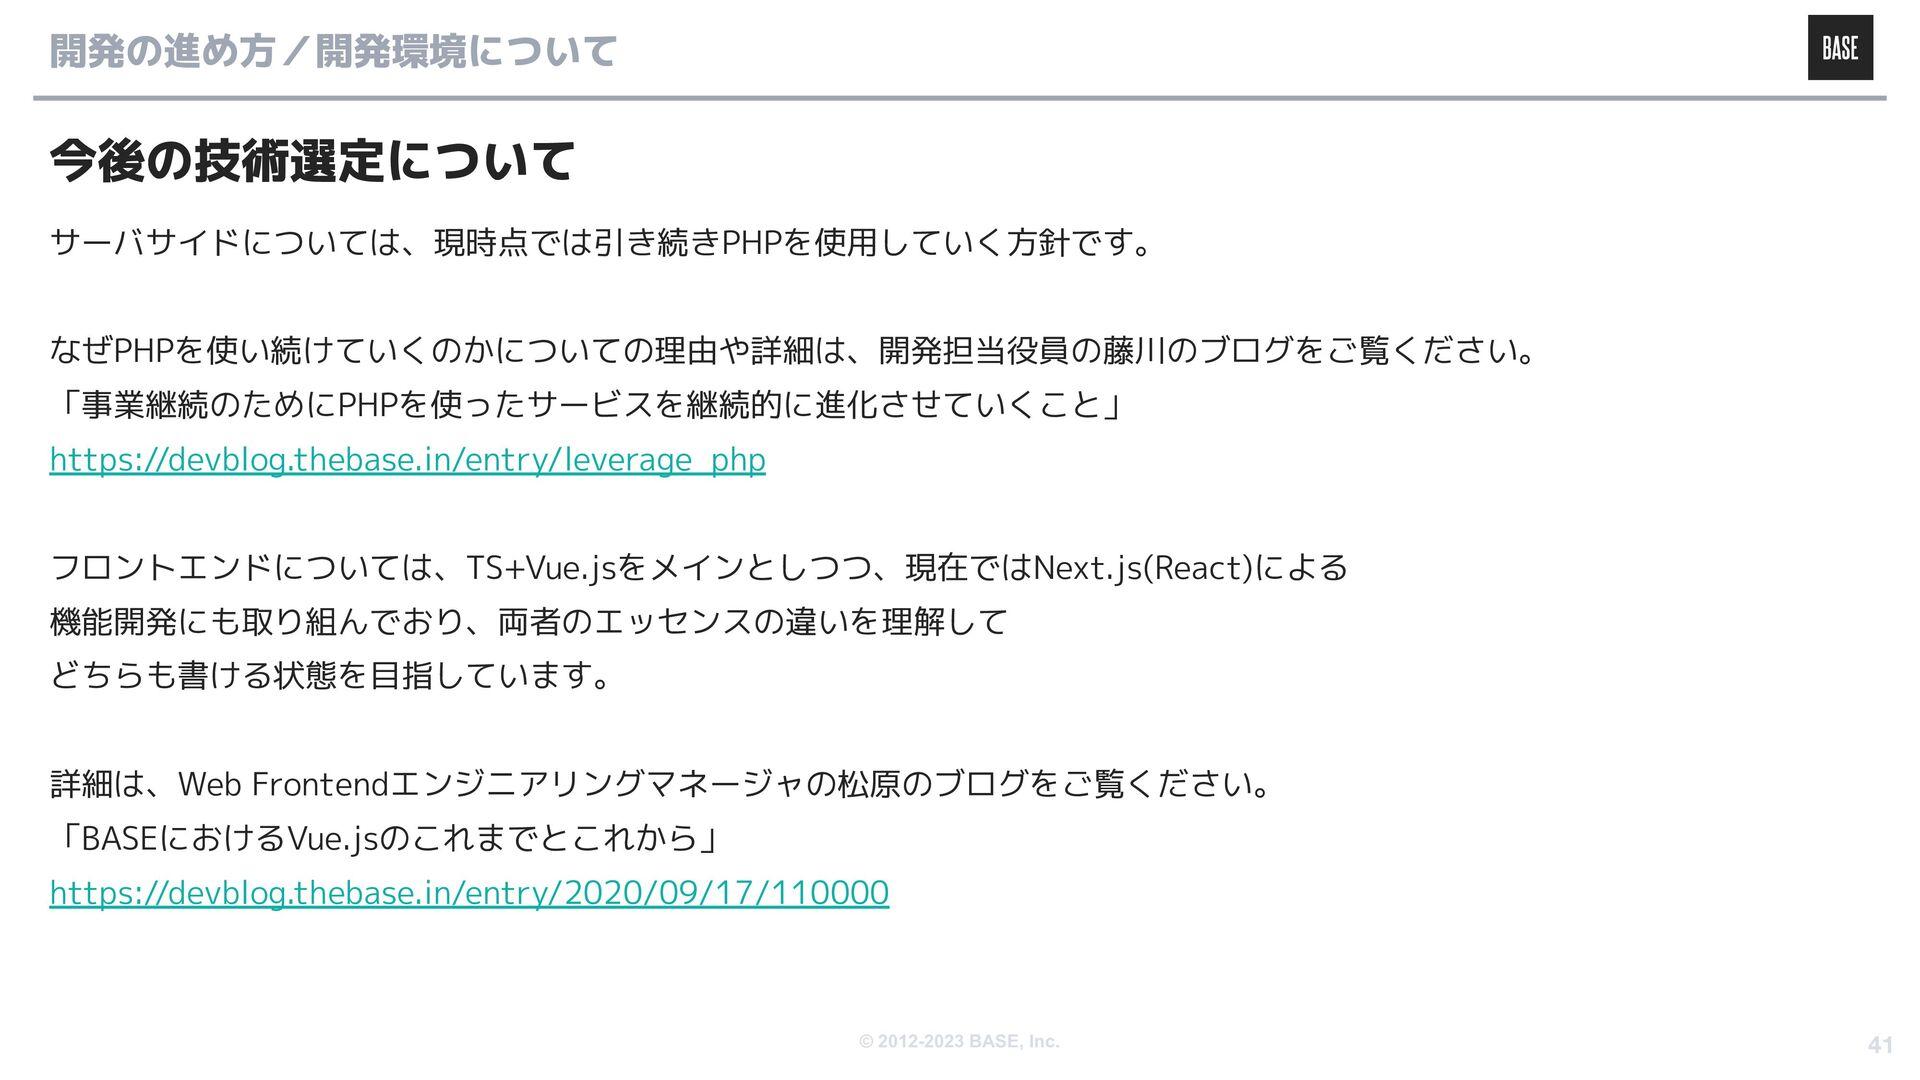 © 2012-2020 BASE, Inc. 目標制度 評価制度について